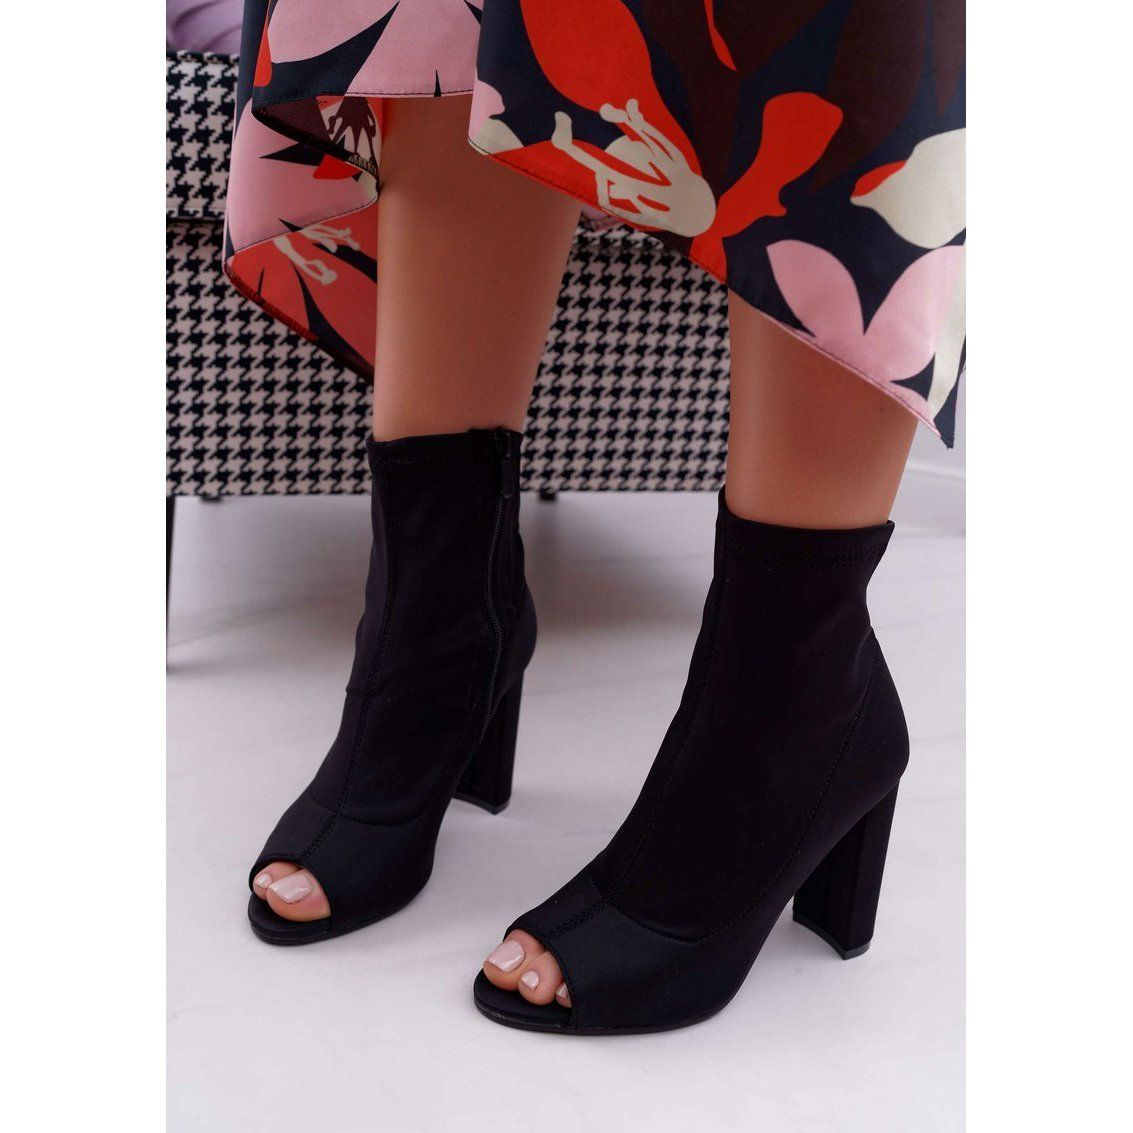 Ps1 Damskie Botki Na Slupku Lycra Odkryte Palce Czarne First Over Knee Boot Shoes Knee Boots